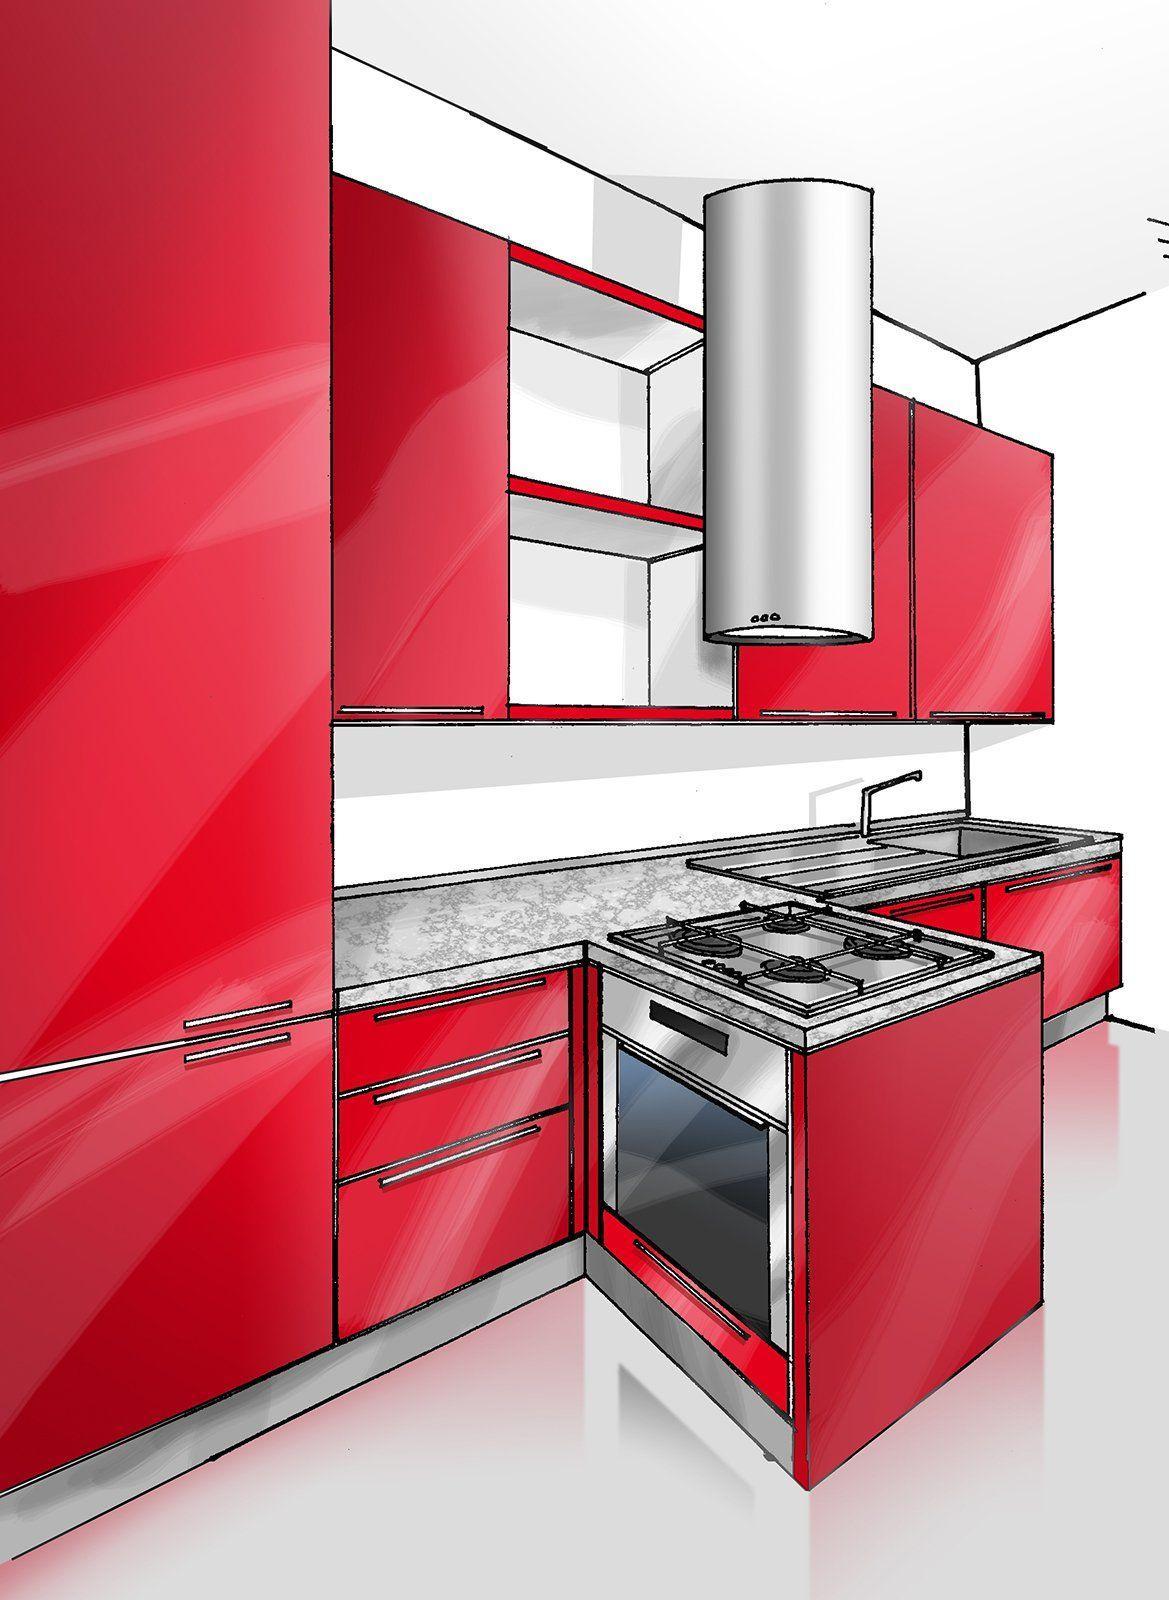 Binario Pensili Cucina Ikea basi cucina in kit